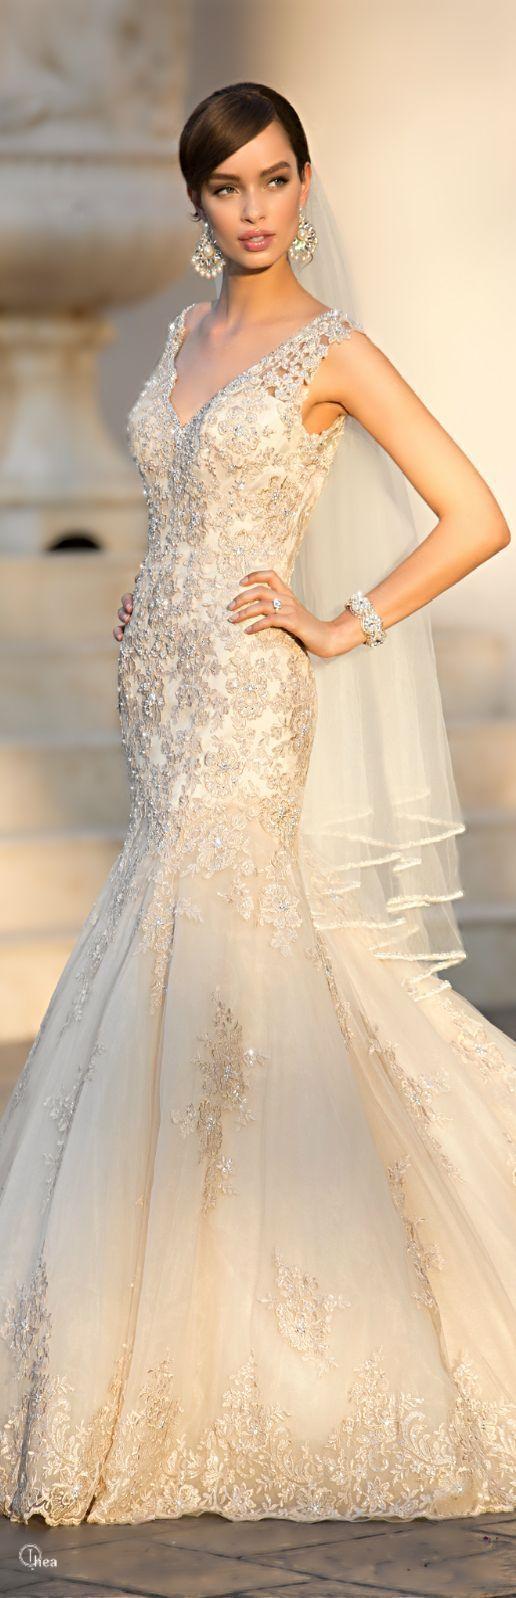 Pink and ivory wedding dress  Aĸιrα  zarif ve güzel  Pinterest  Wedding dress Wedding